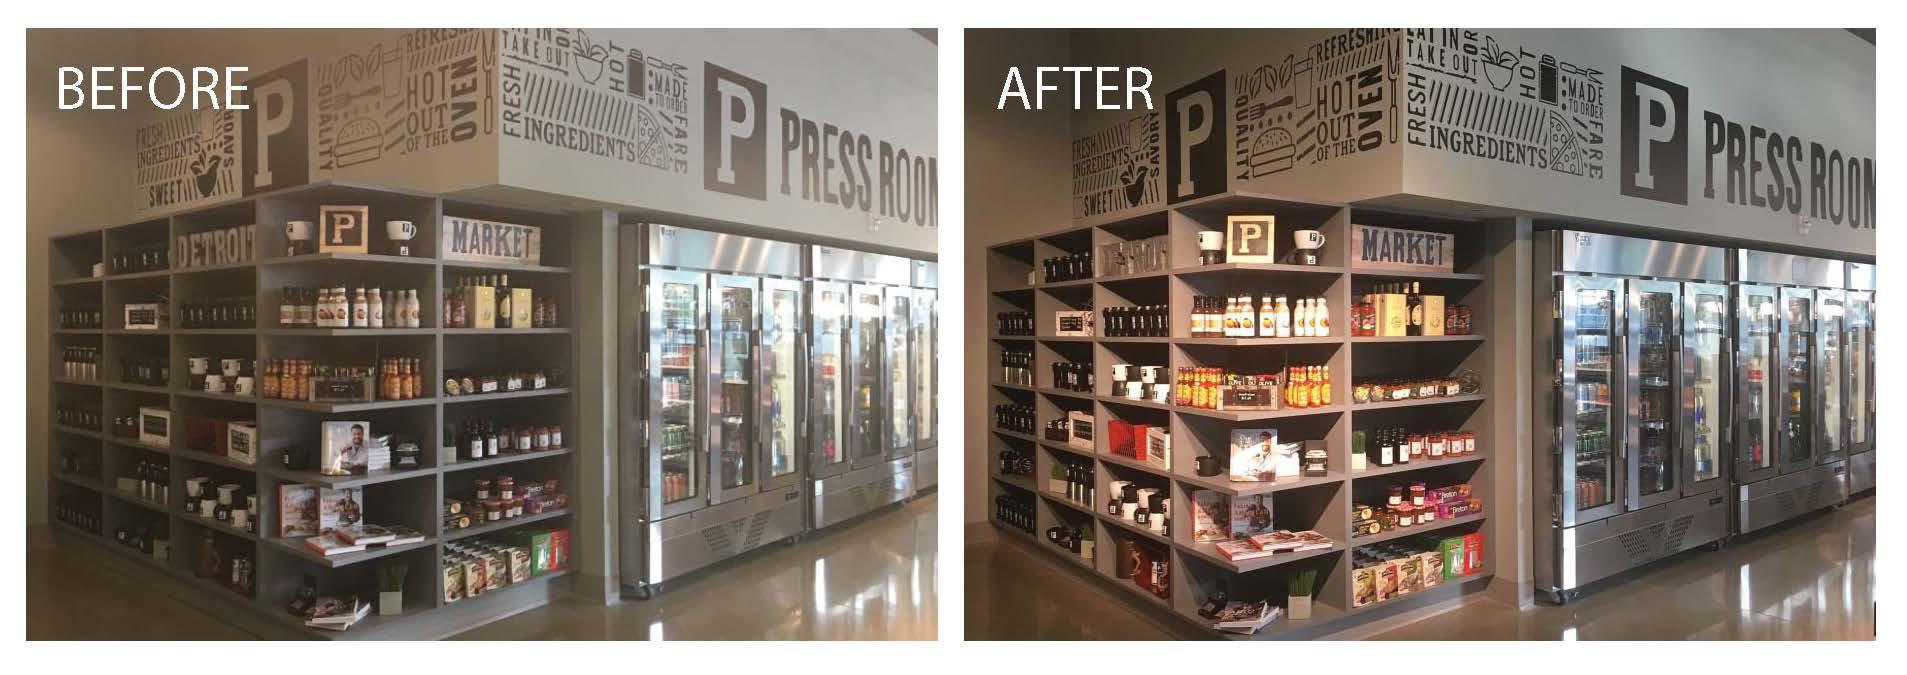 Illuminart Provides Architectural Lighting Design Solutions for Detroit Press Room Café and Market